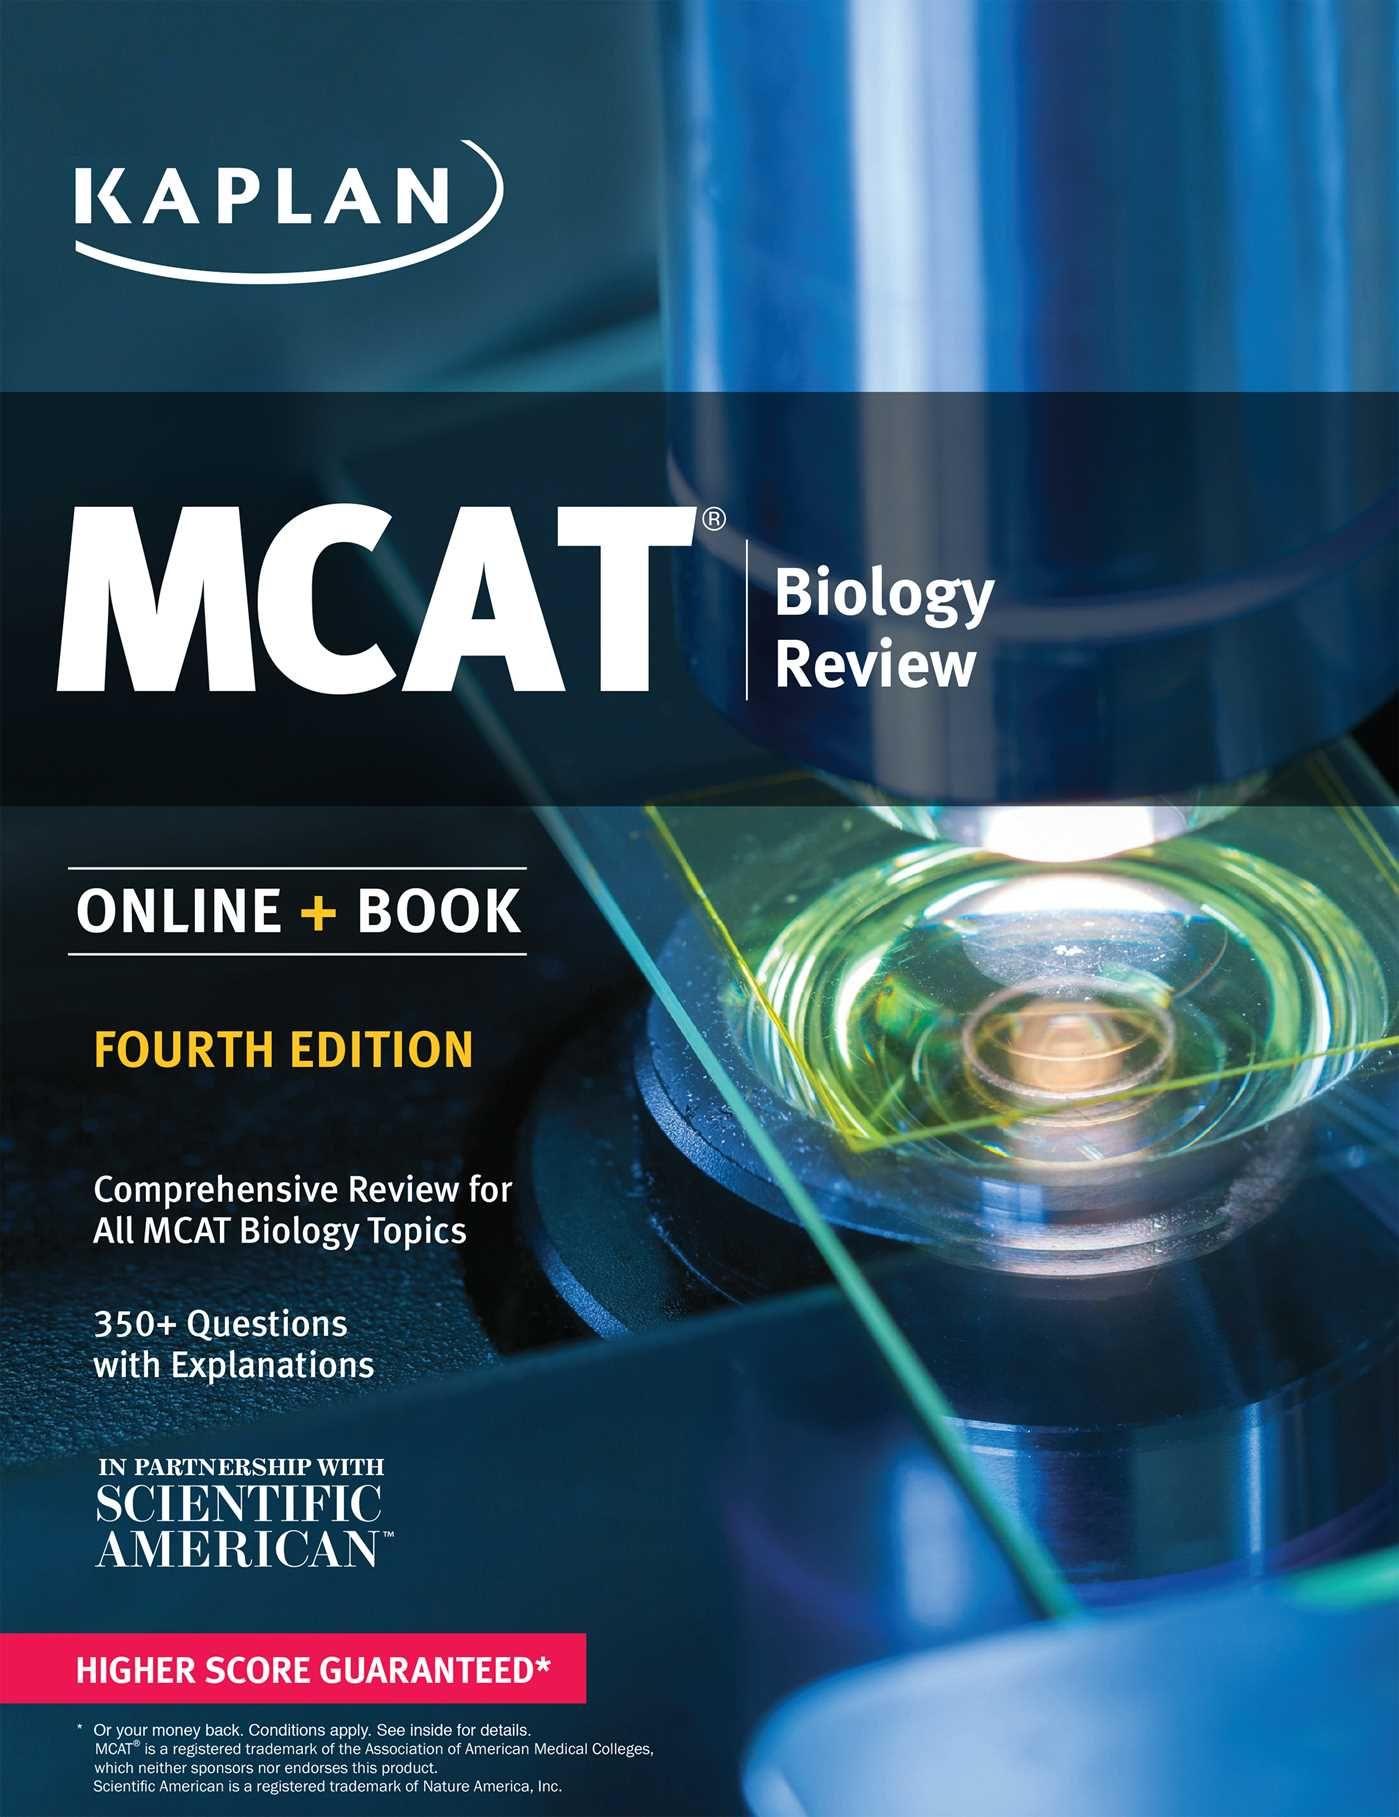 9781506223773 - MCAT Biology Review 2018-2019: Online + Book (Kaplan